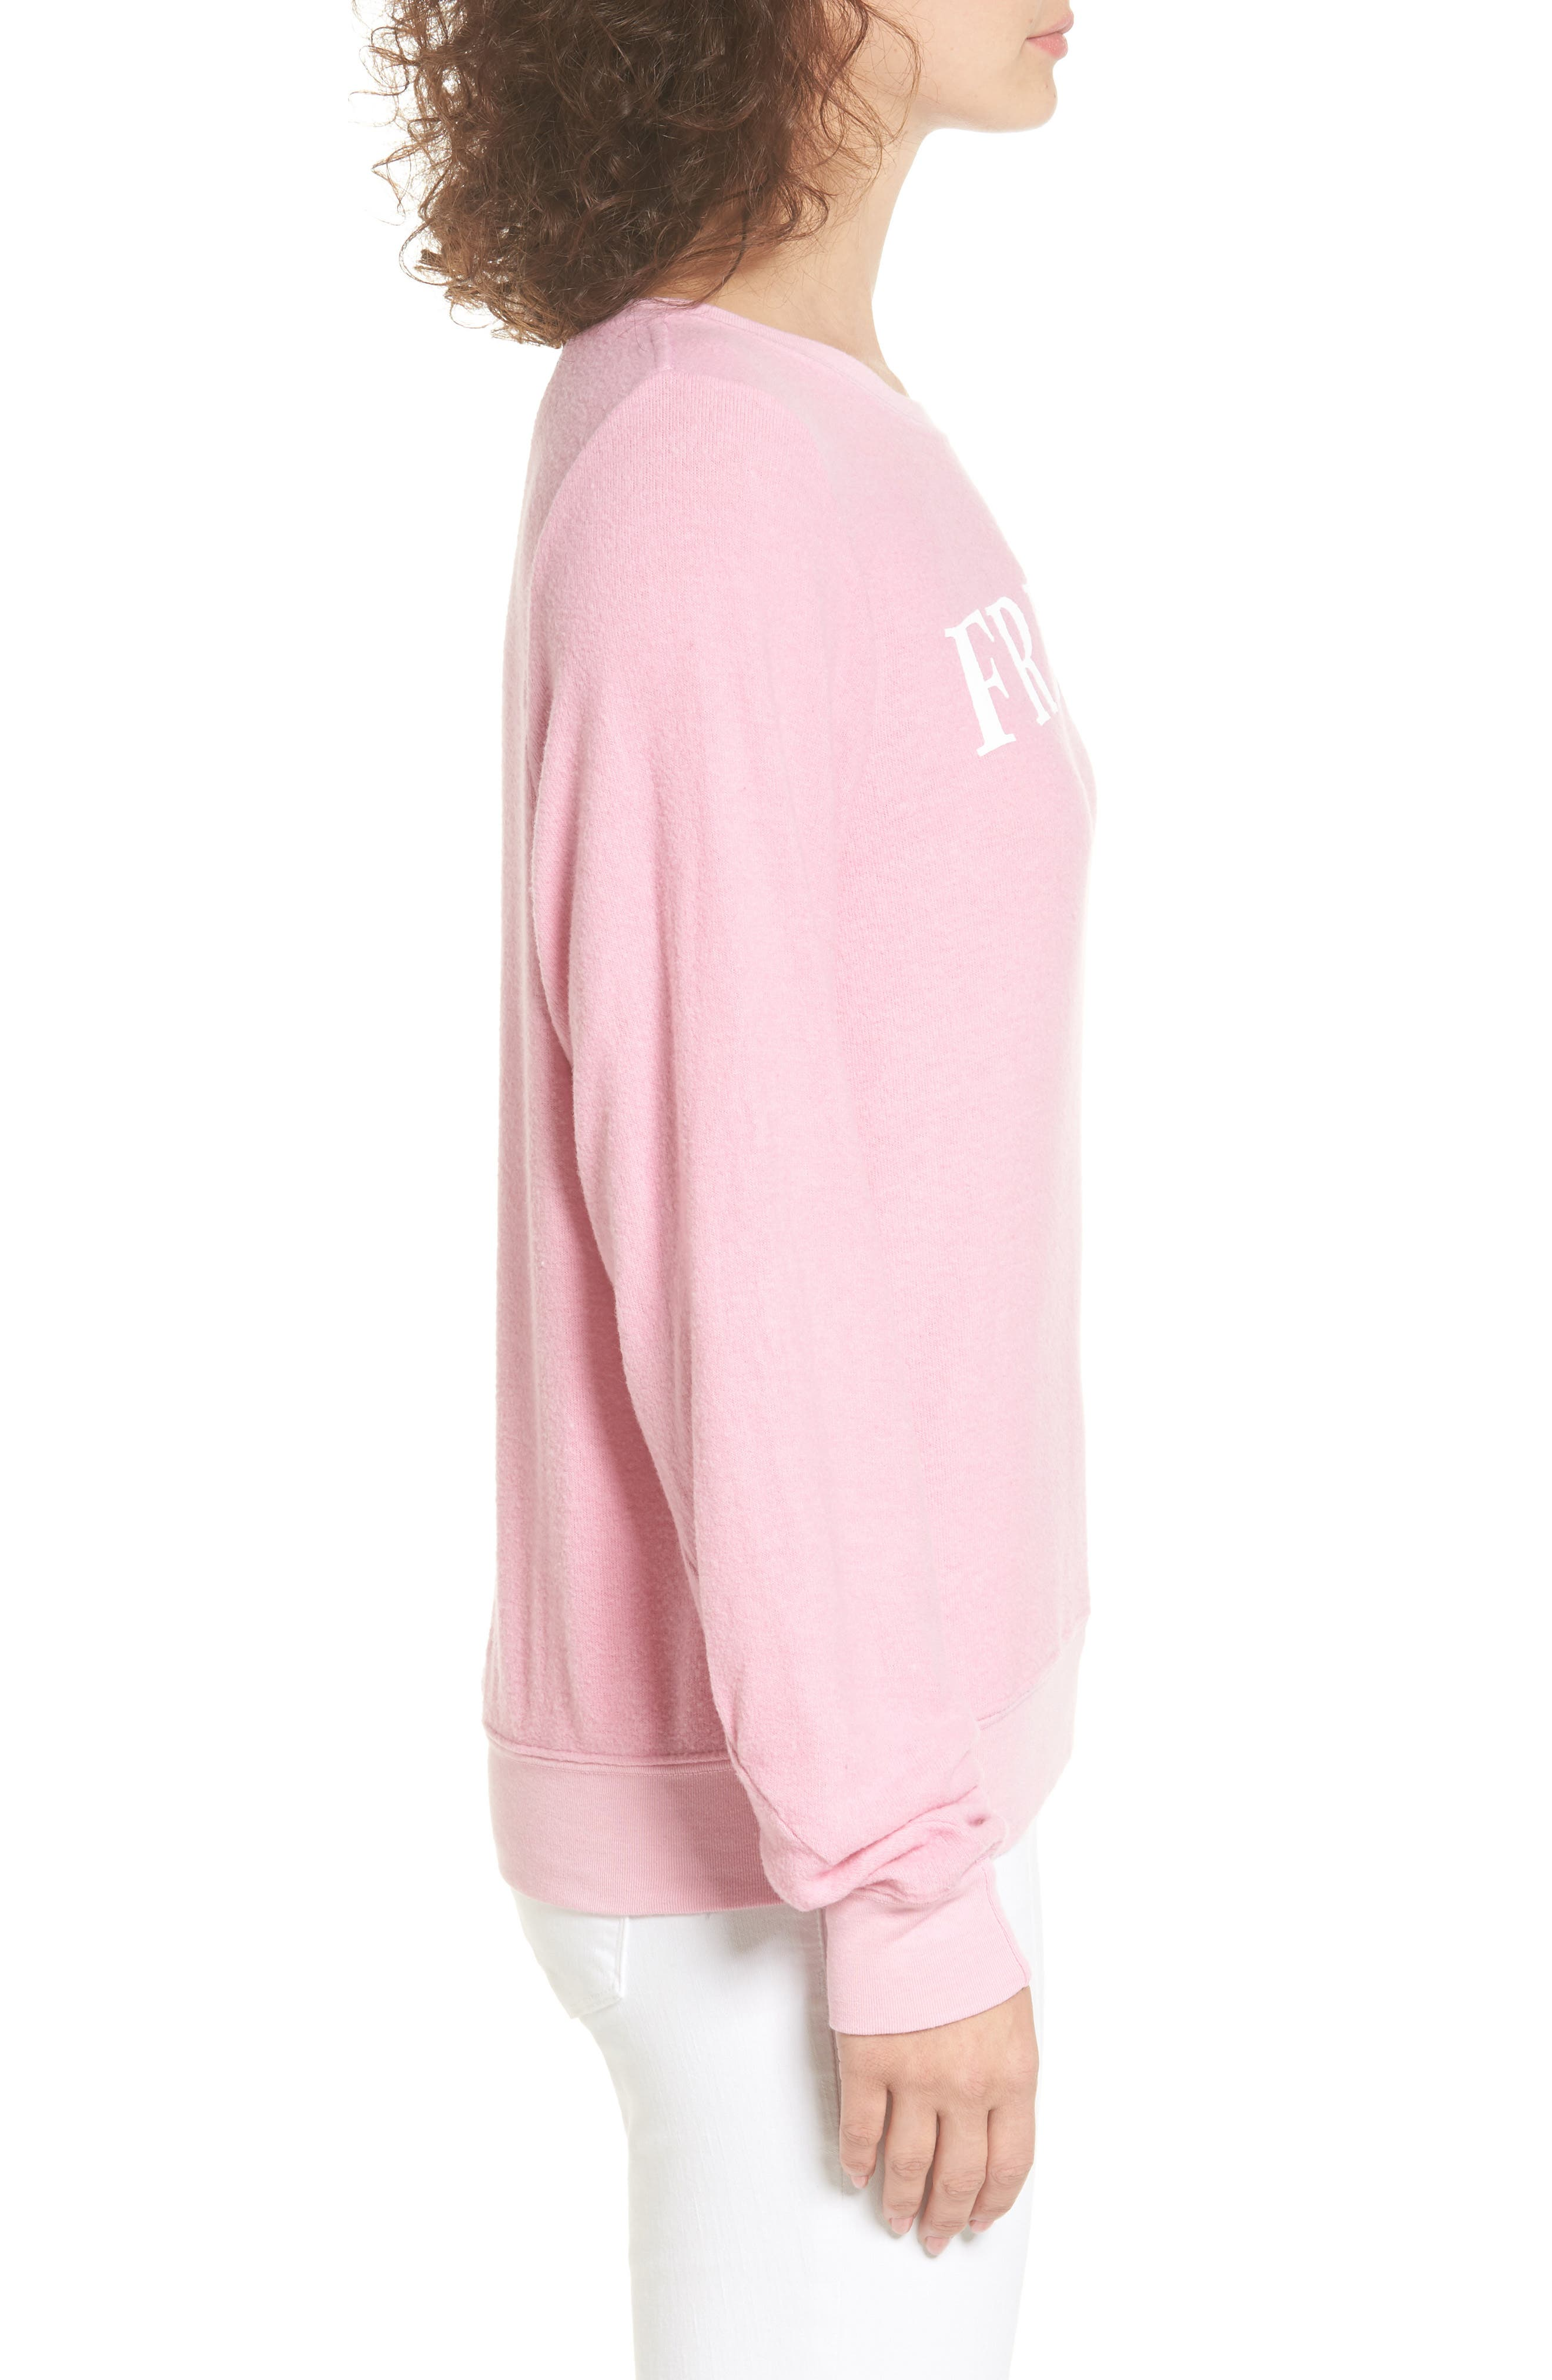 Friday Sweatshirt,                             Alternate thumbnail 3, color,                             Pink